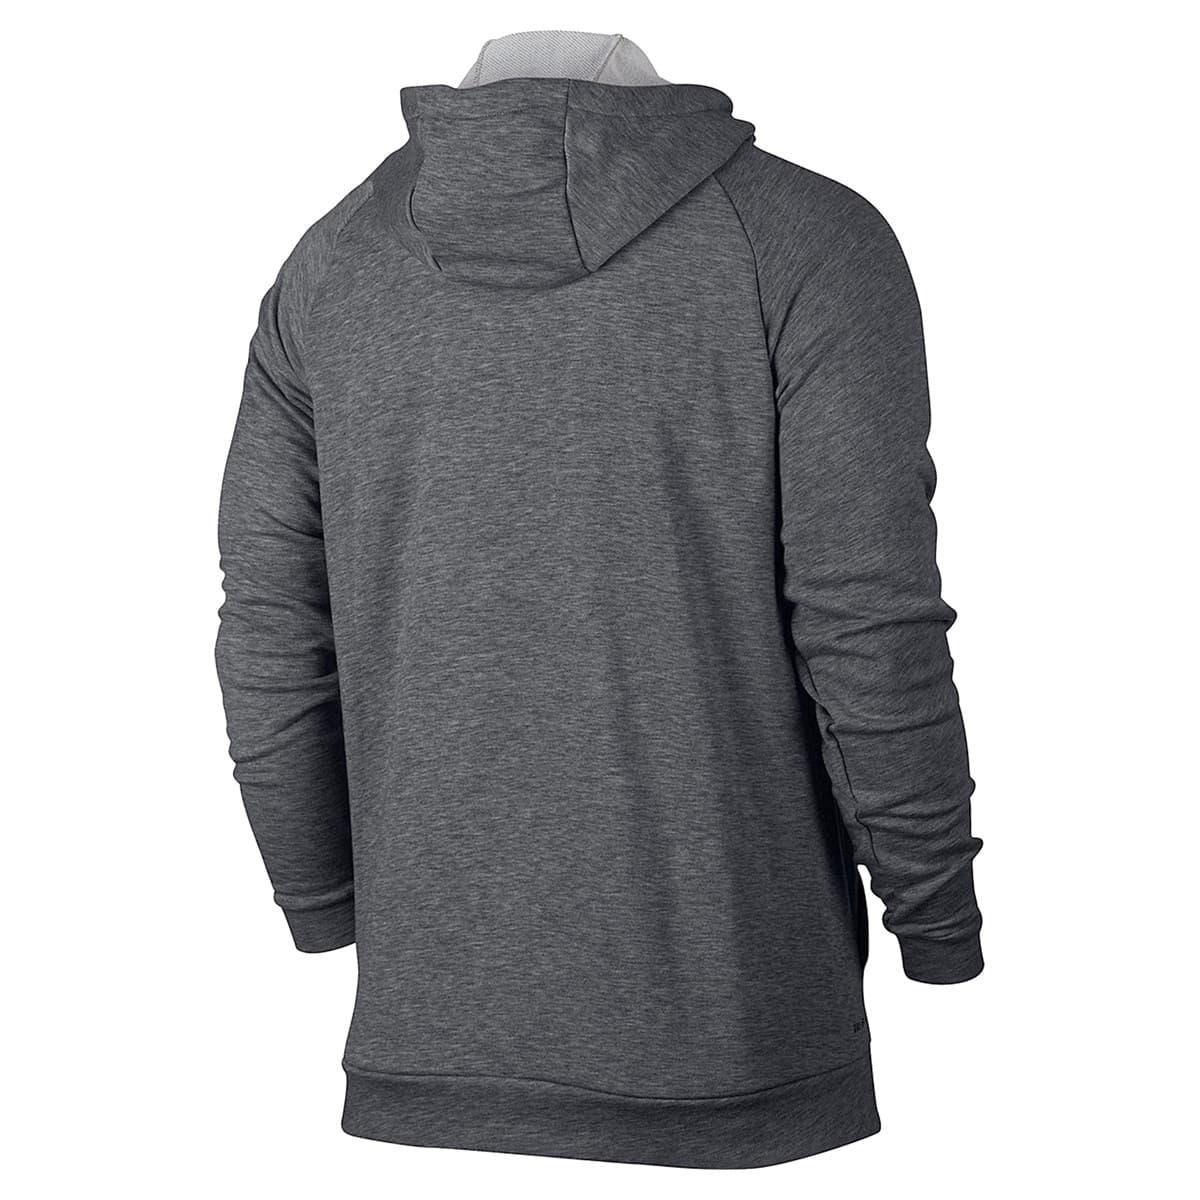 Dri-Fit Fleece Erkek Gri Kapüşonlu Sweatshirt